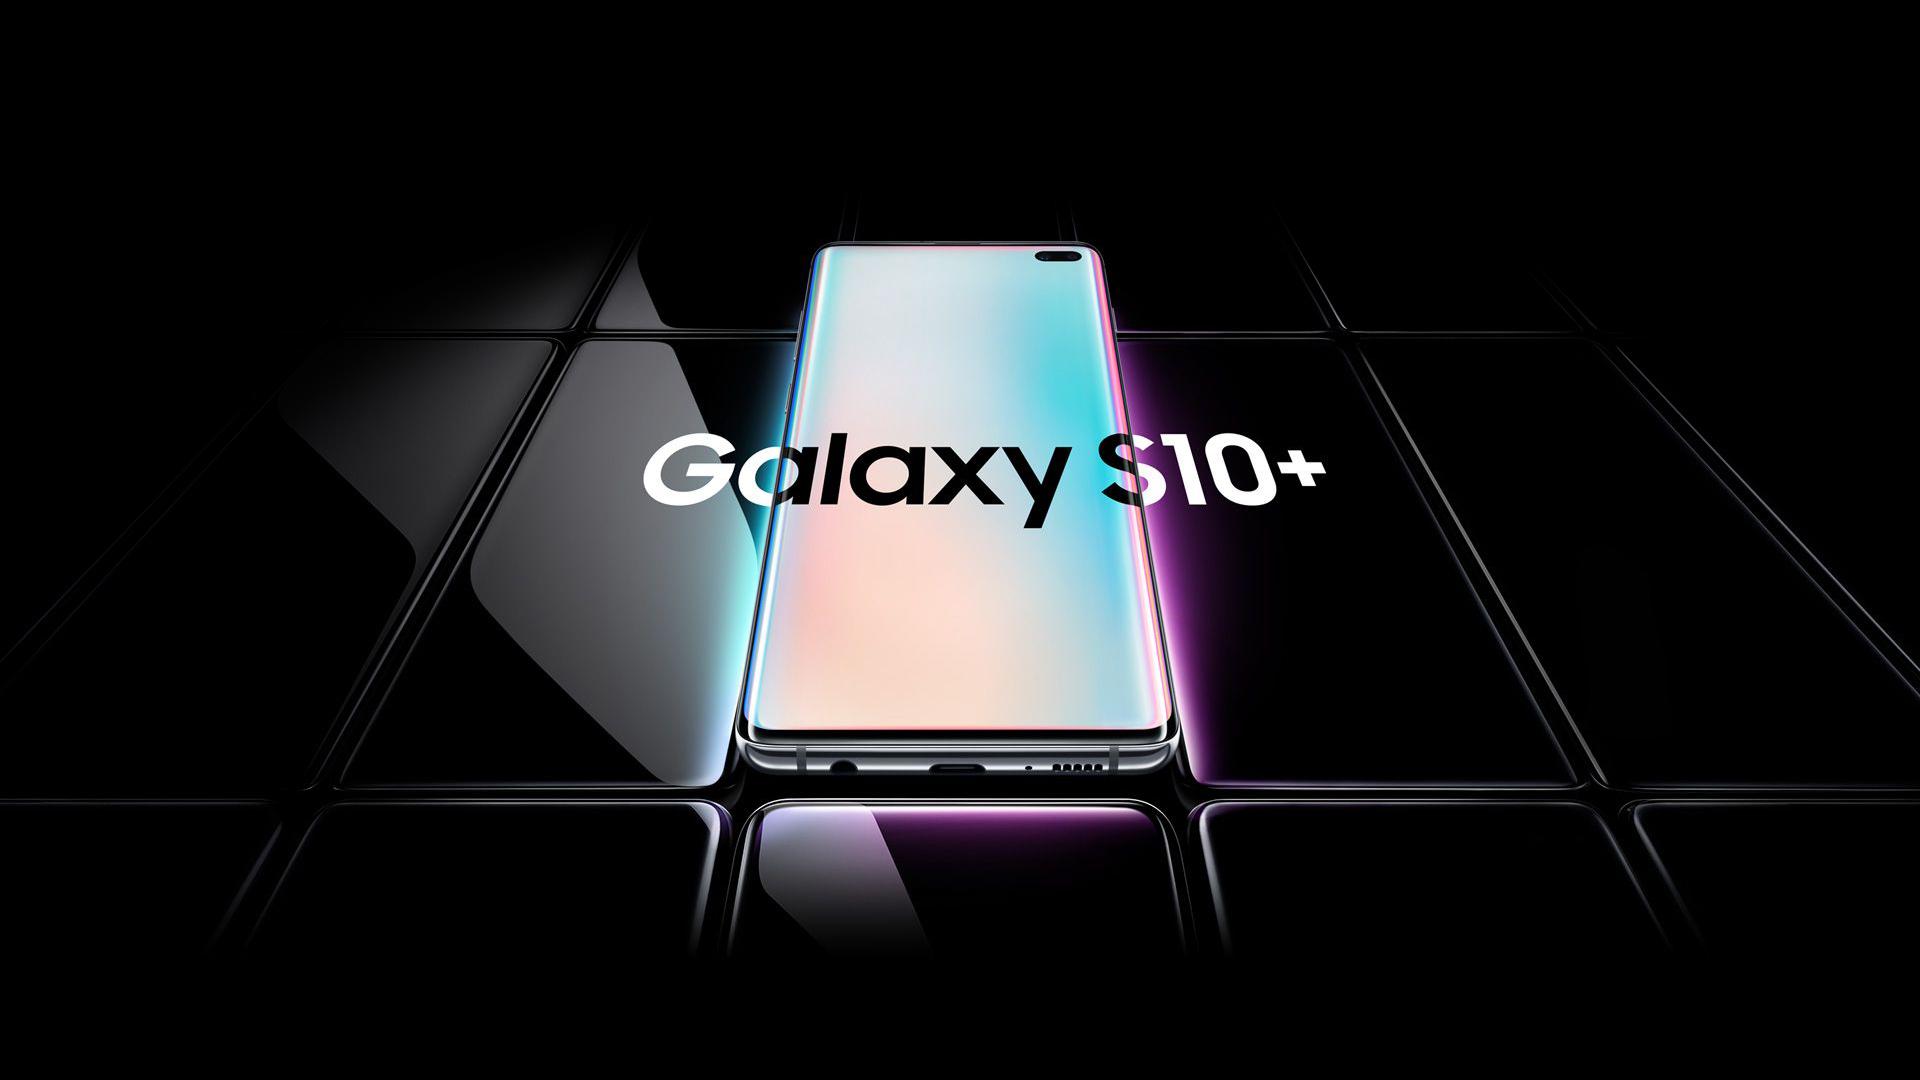 Samsung Galaxy Hd Wallpaper Background Image 1920x1080 Id